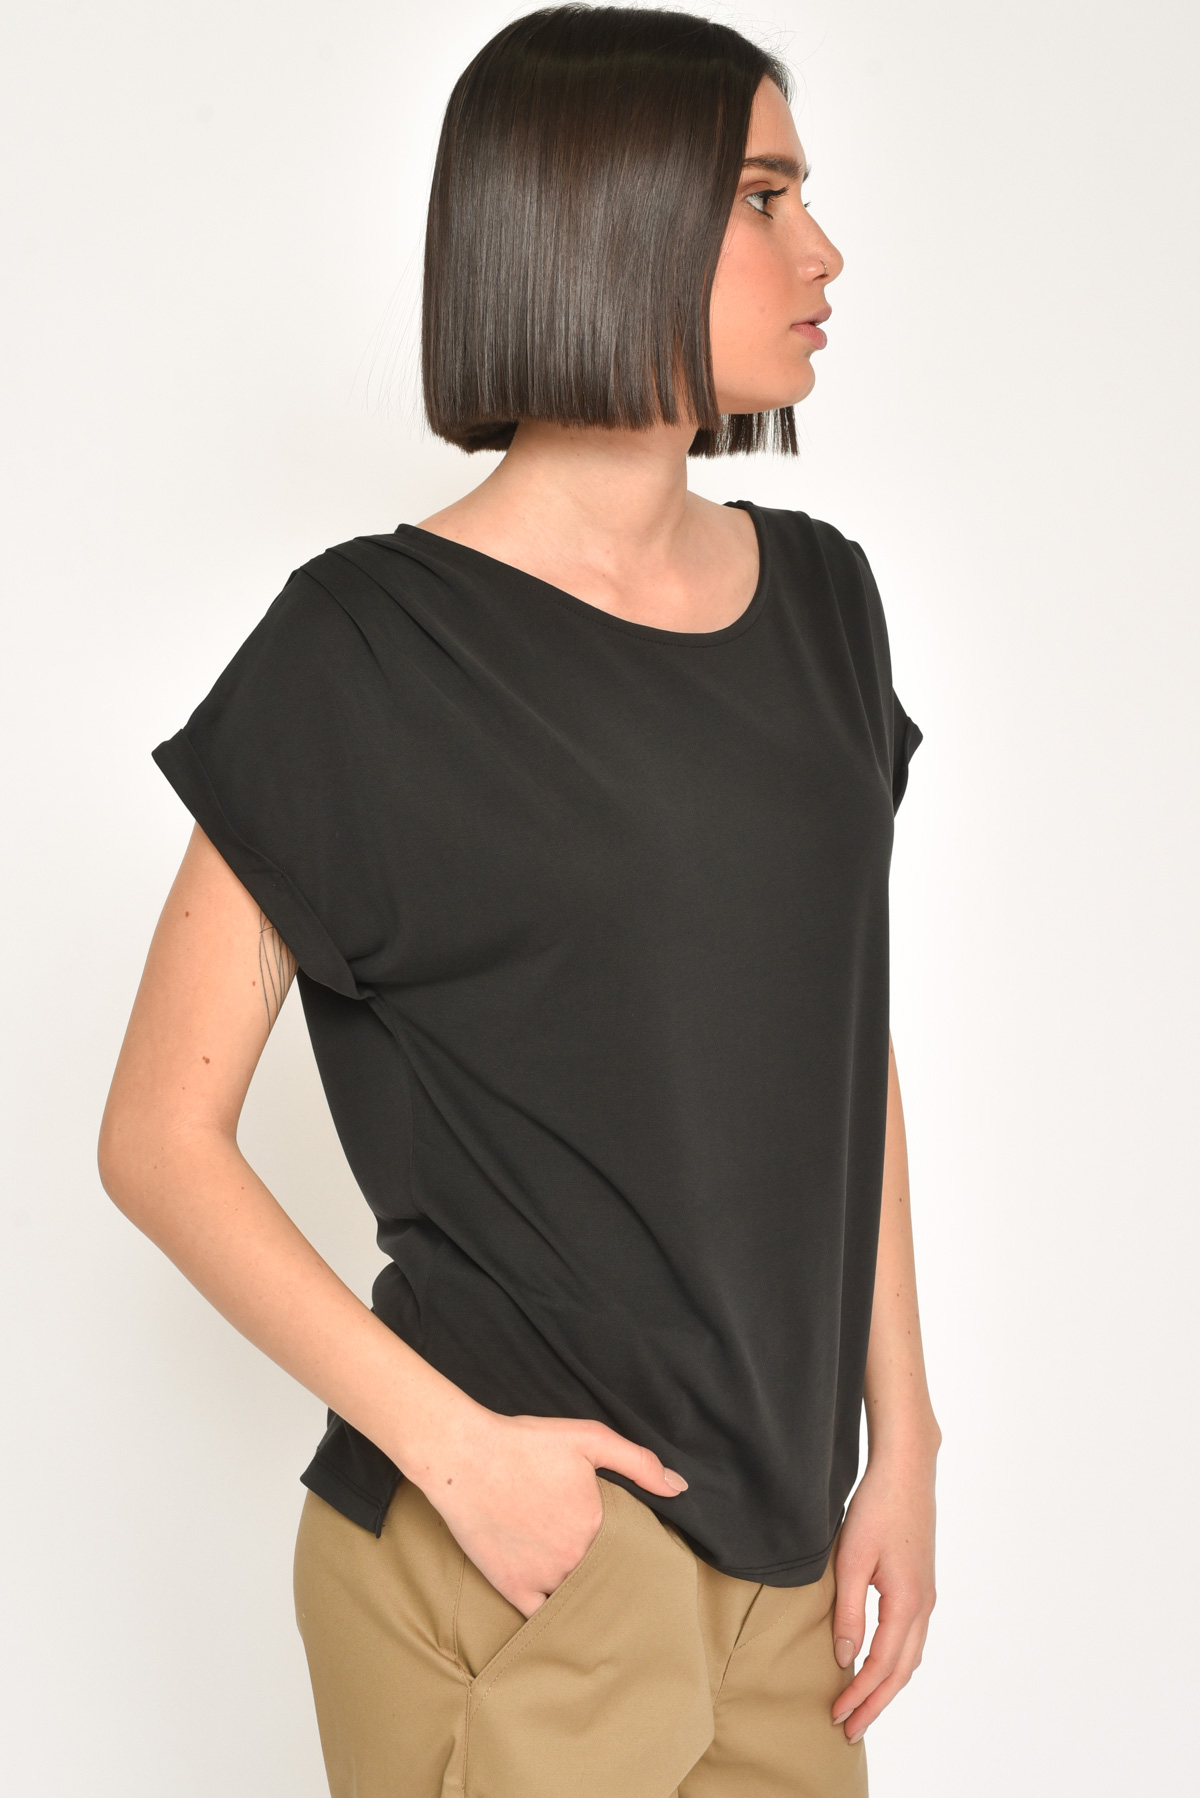 T-SHIRT LINEA MORBIDA CON SCOLLO A BARCA for women - BLACK - Paquito Pronto Moda Shop Online